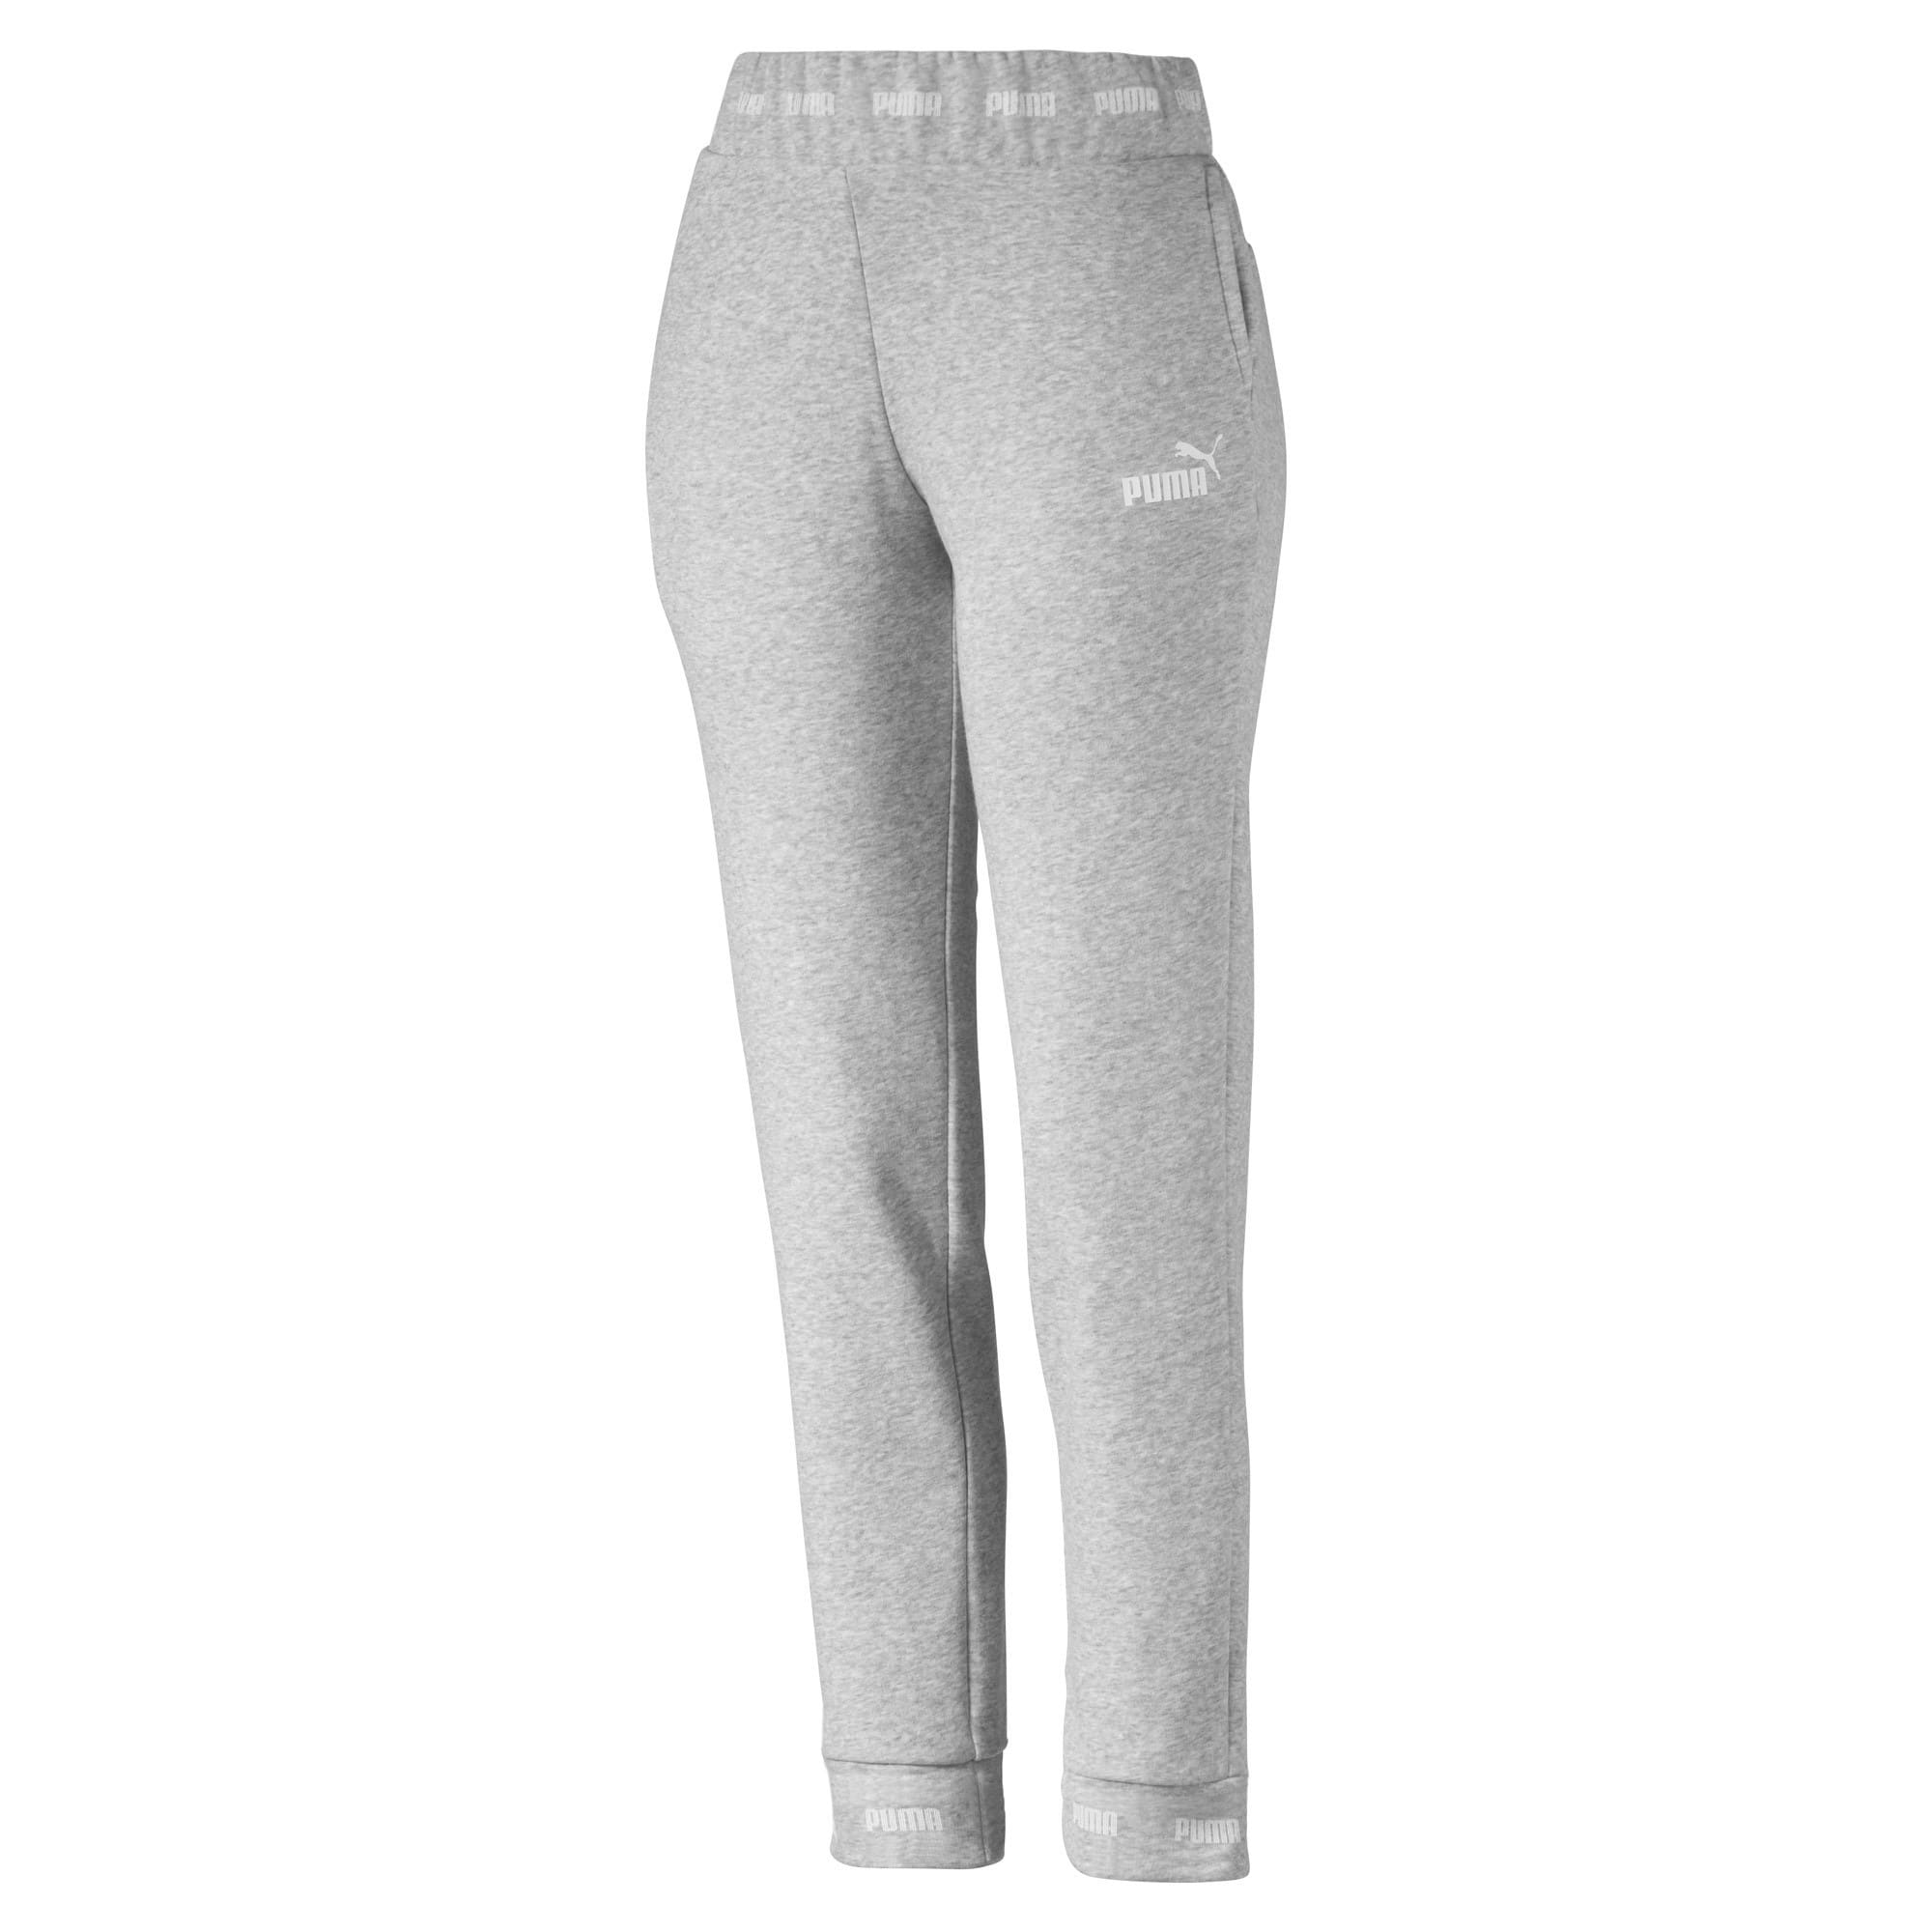 Thumbnail 1 of Amplified Women's Sweatpants, Light Gray Heather, medium